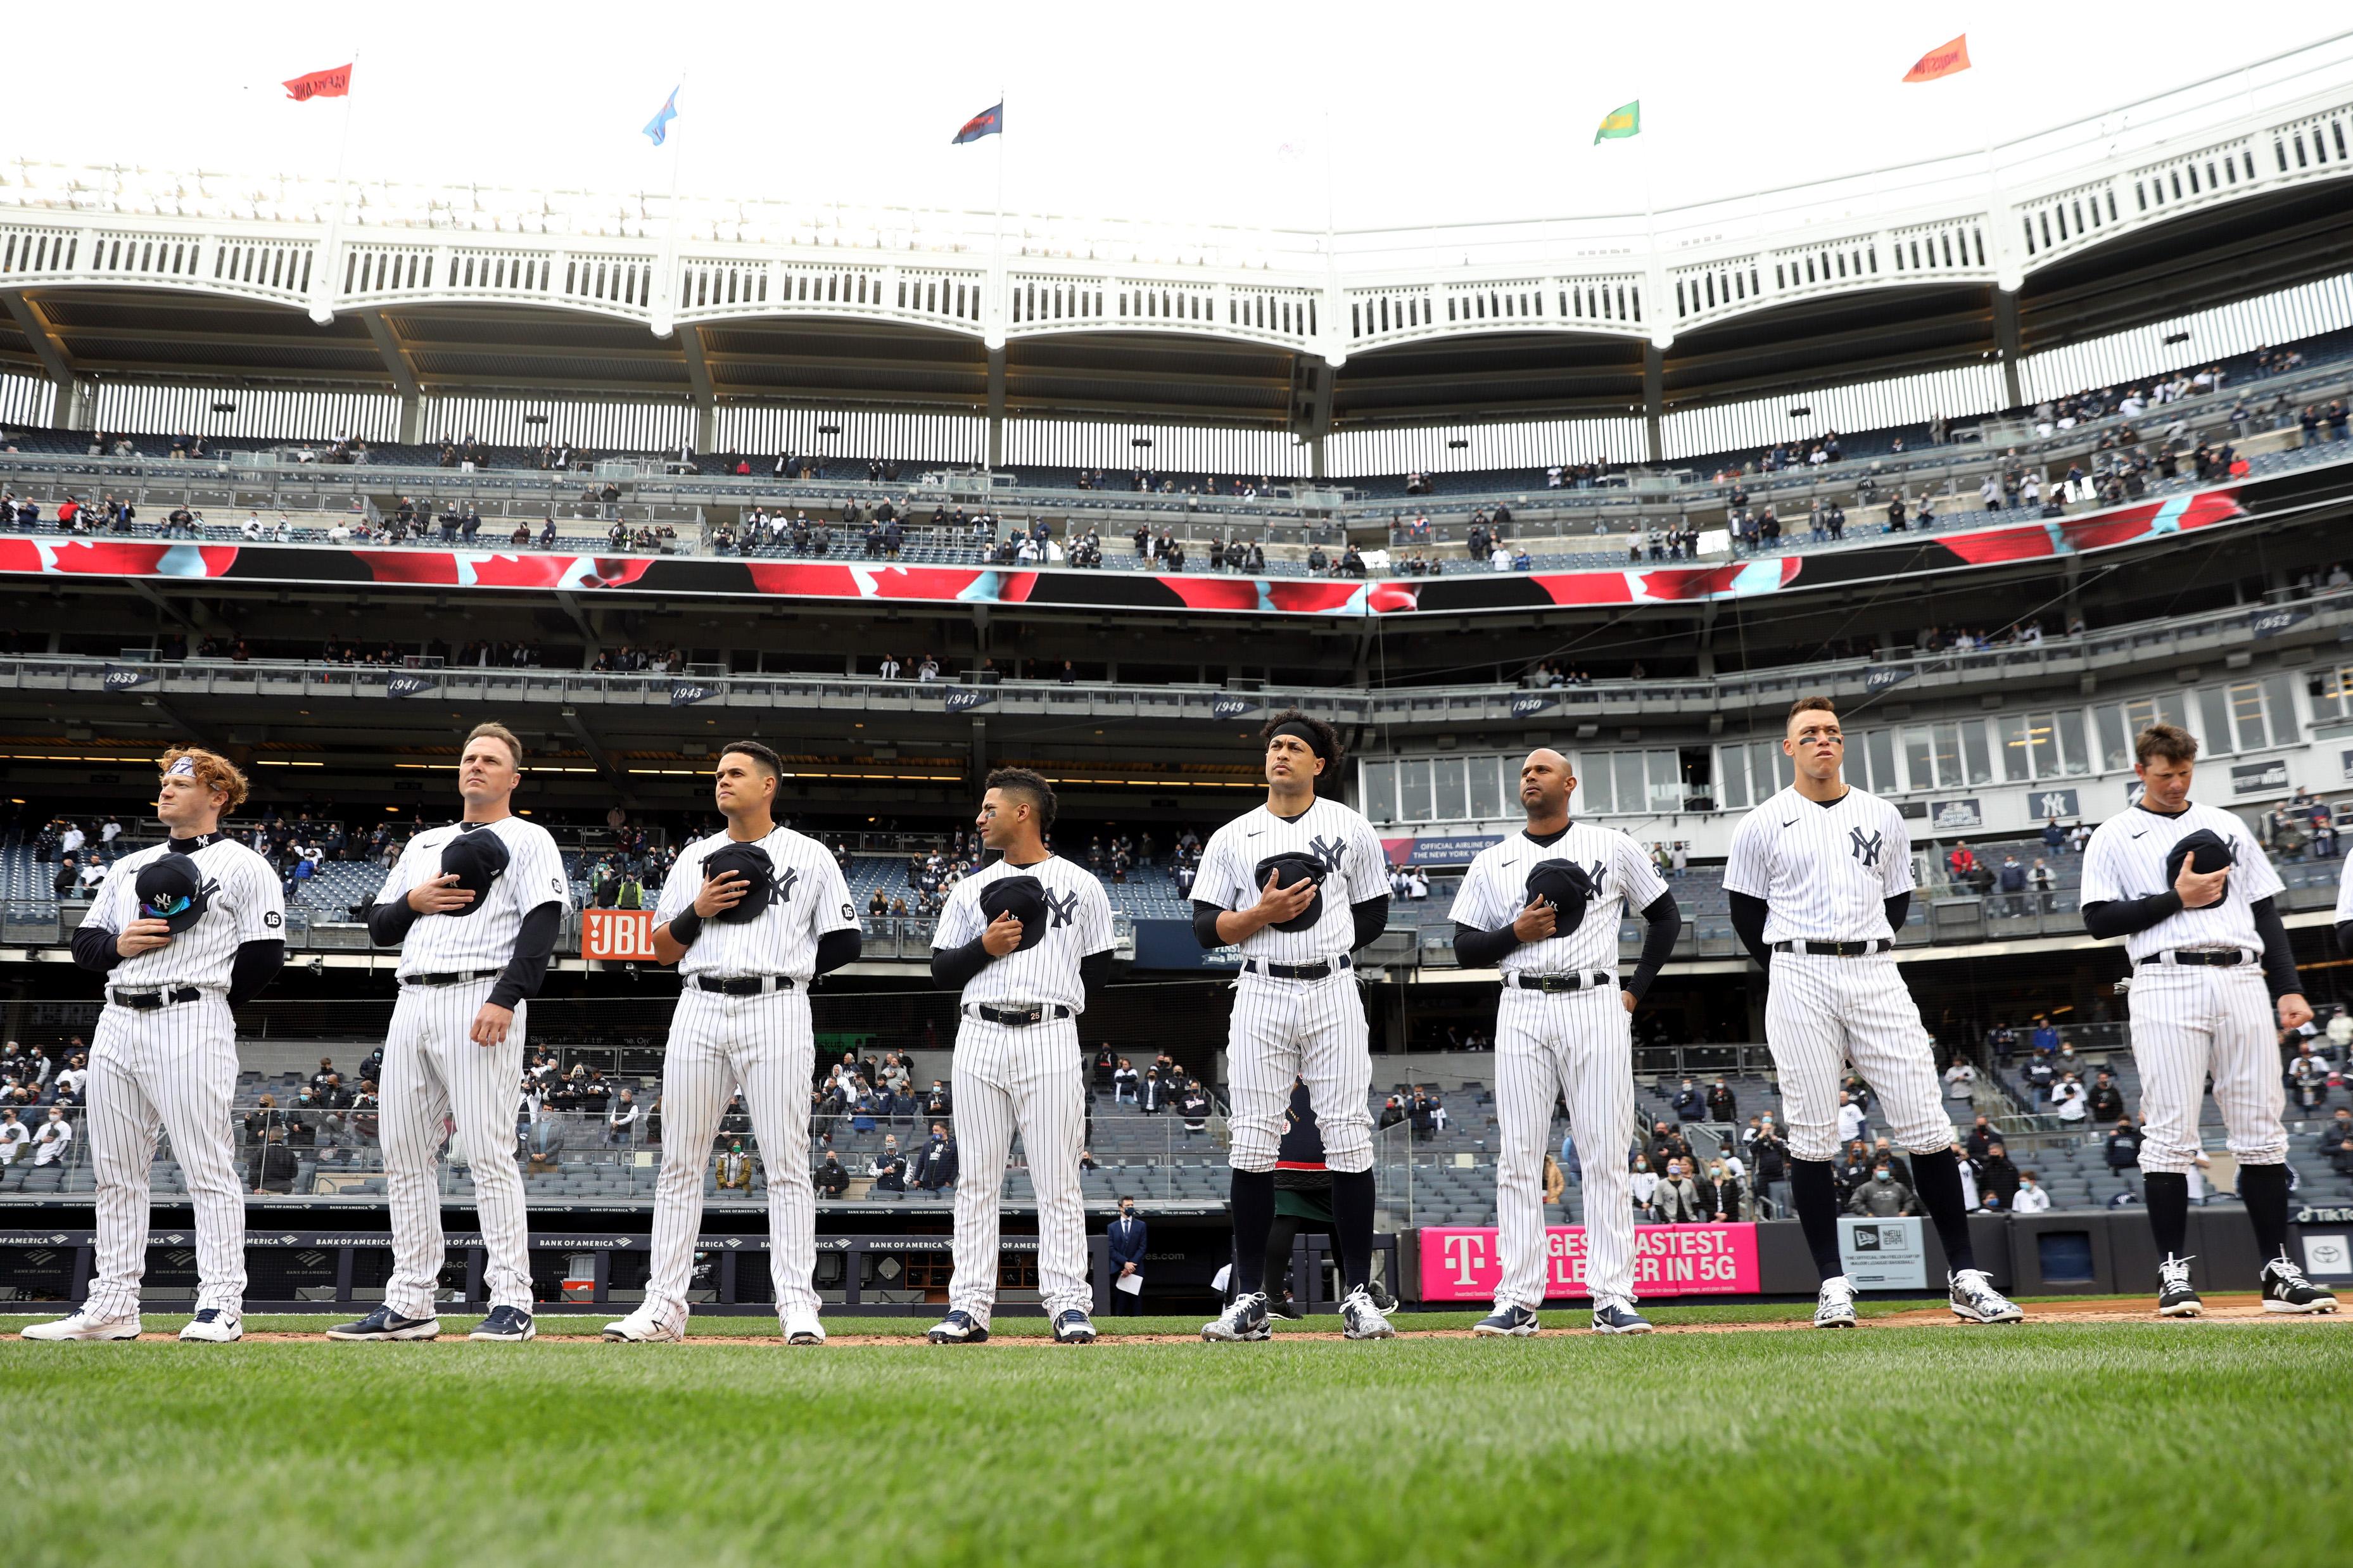 Toronto Blue Jays v. New York Yankees